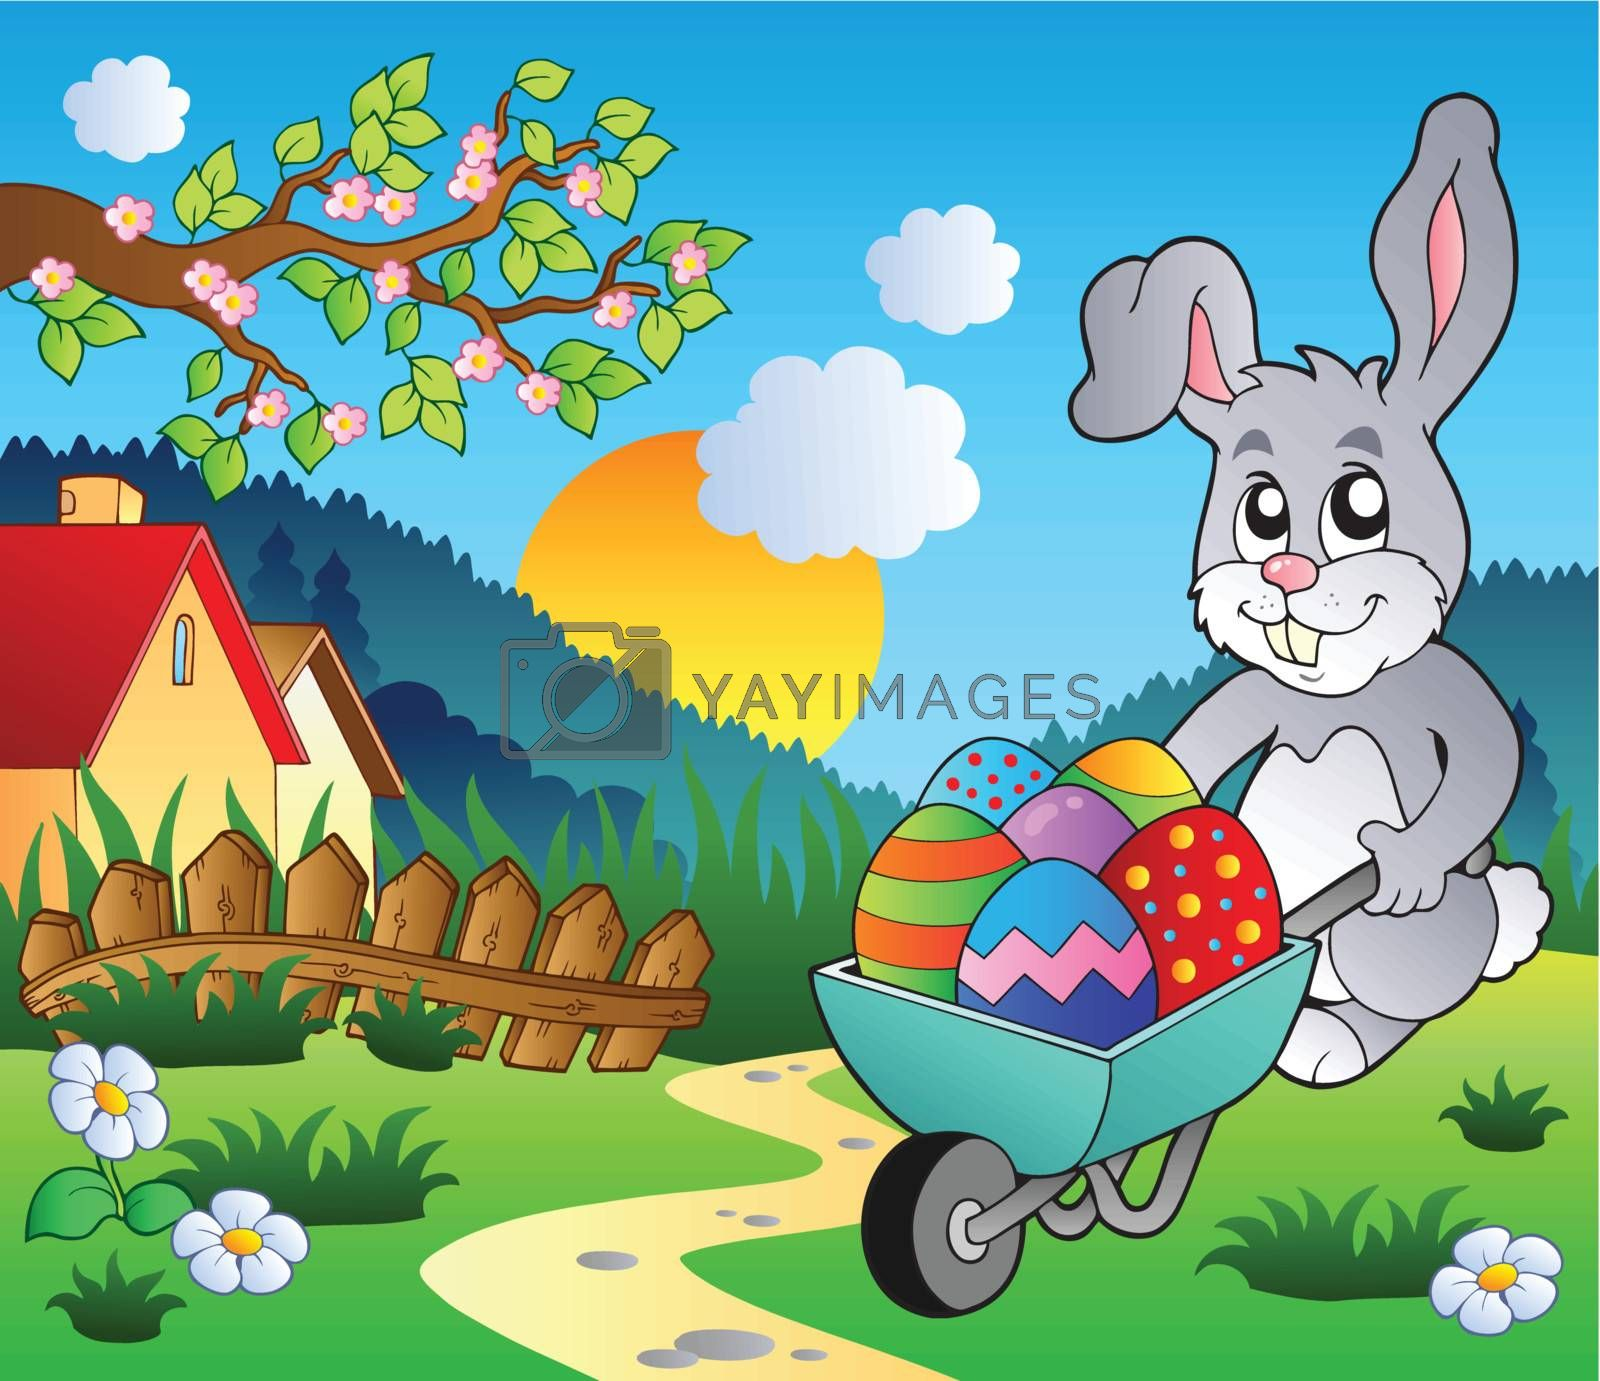 Meadow with bunny and wheelbarrow - vector illustration.